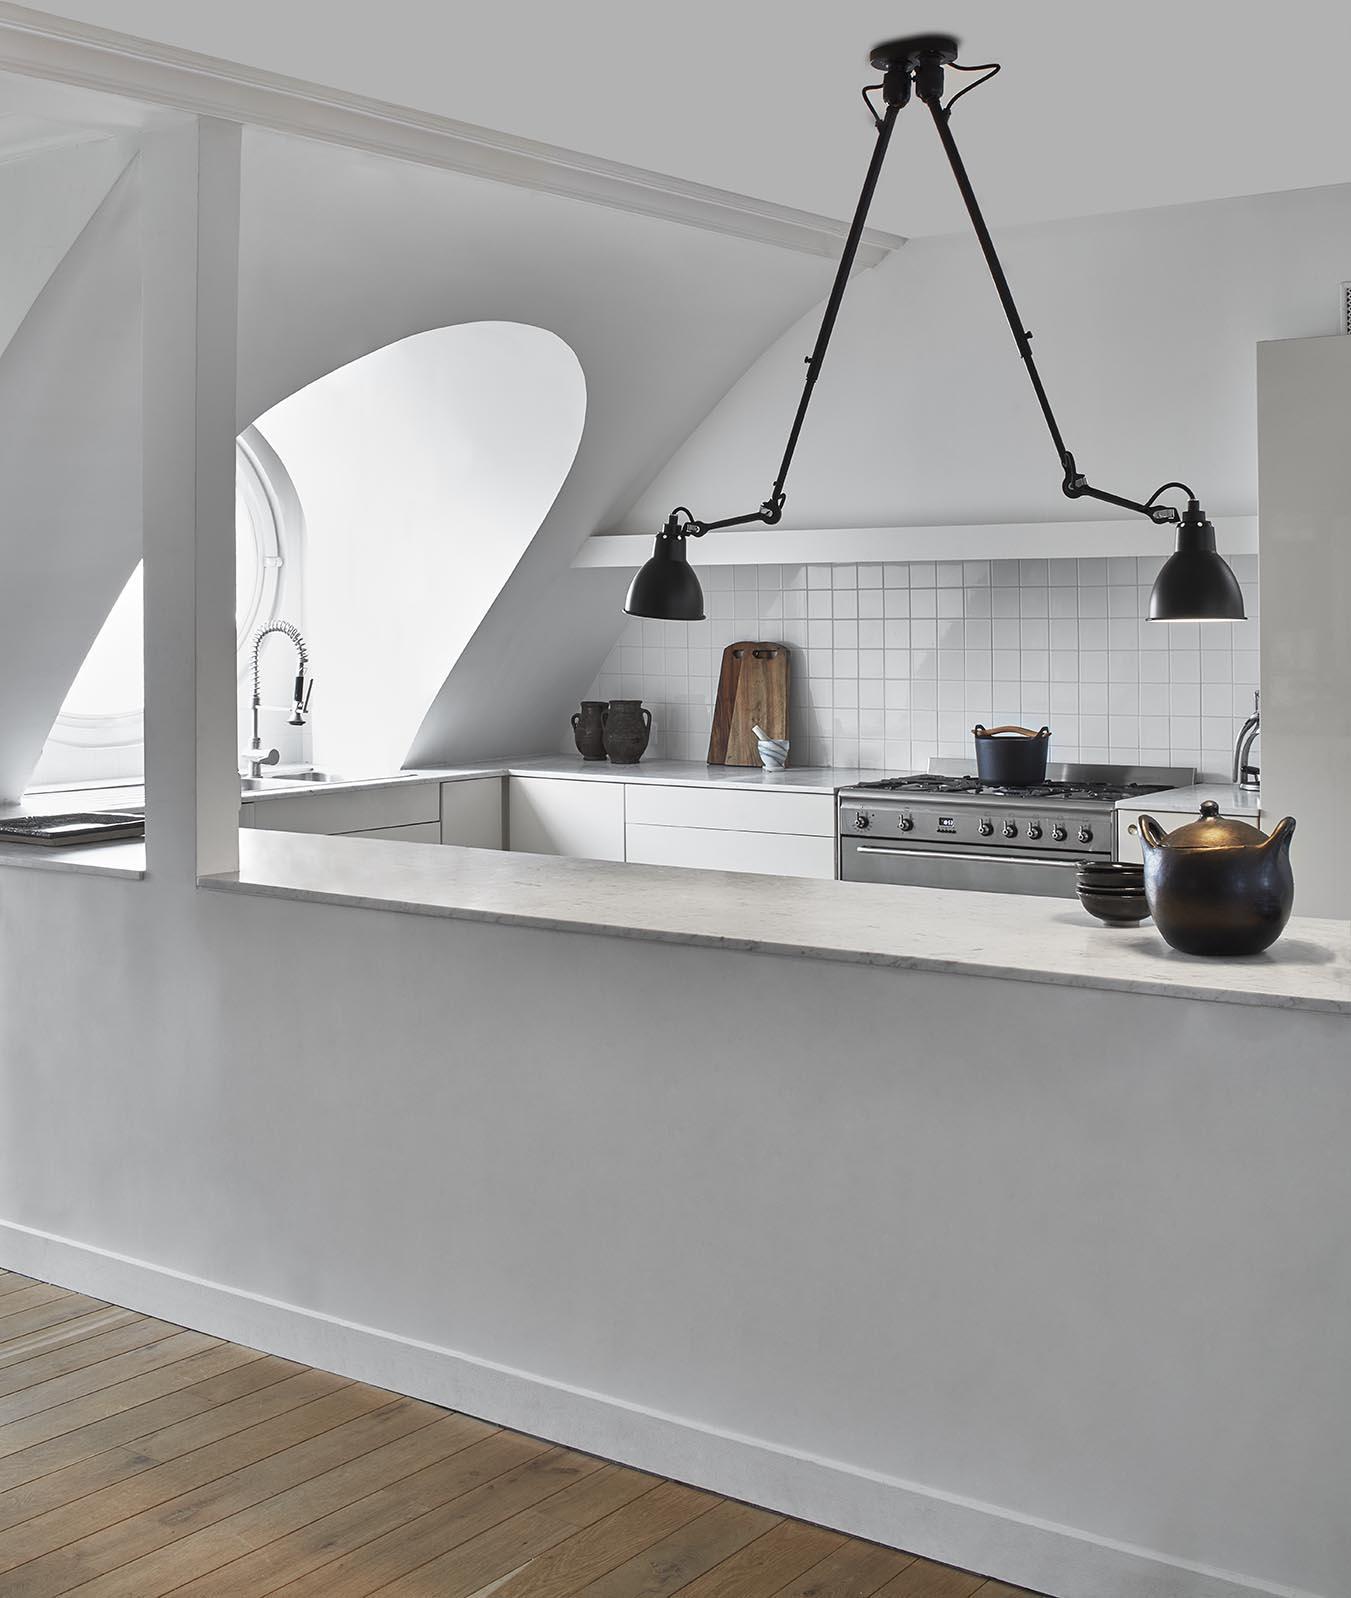 lampe gras n 302 black general lighting from dcw. Black Bedroom Furniture Sets. Home Design Ideas